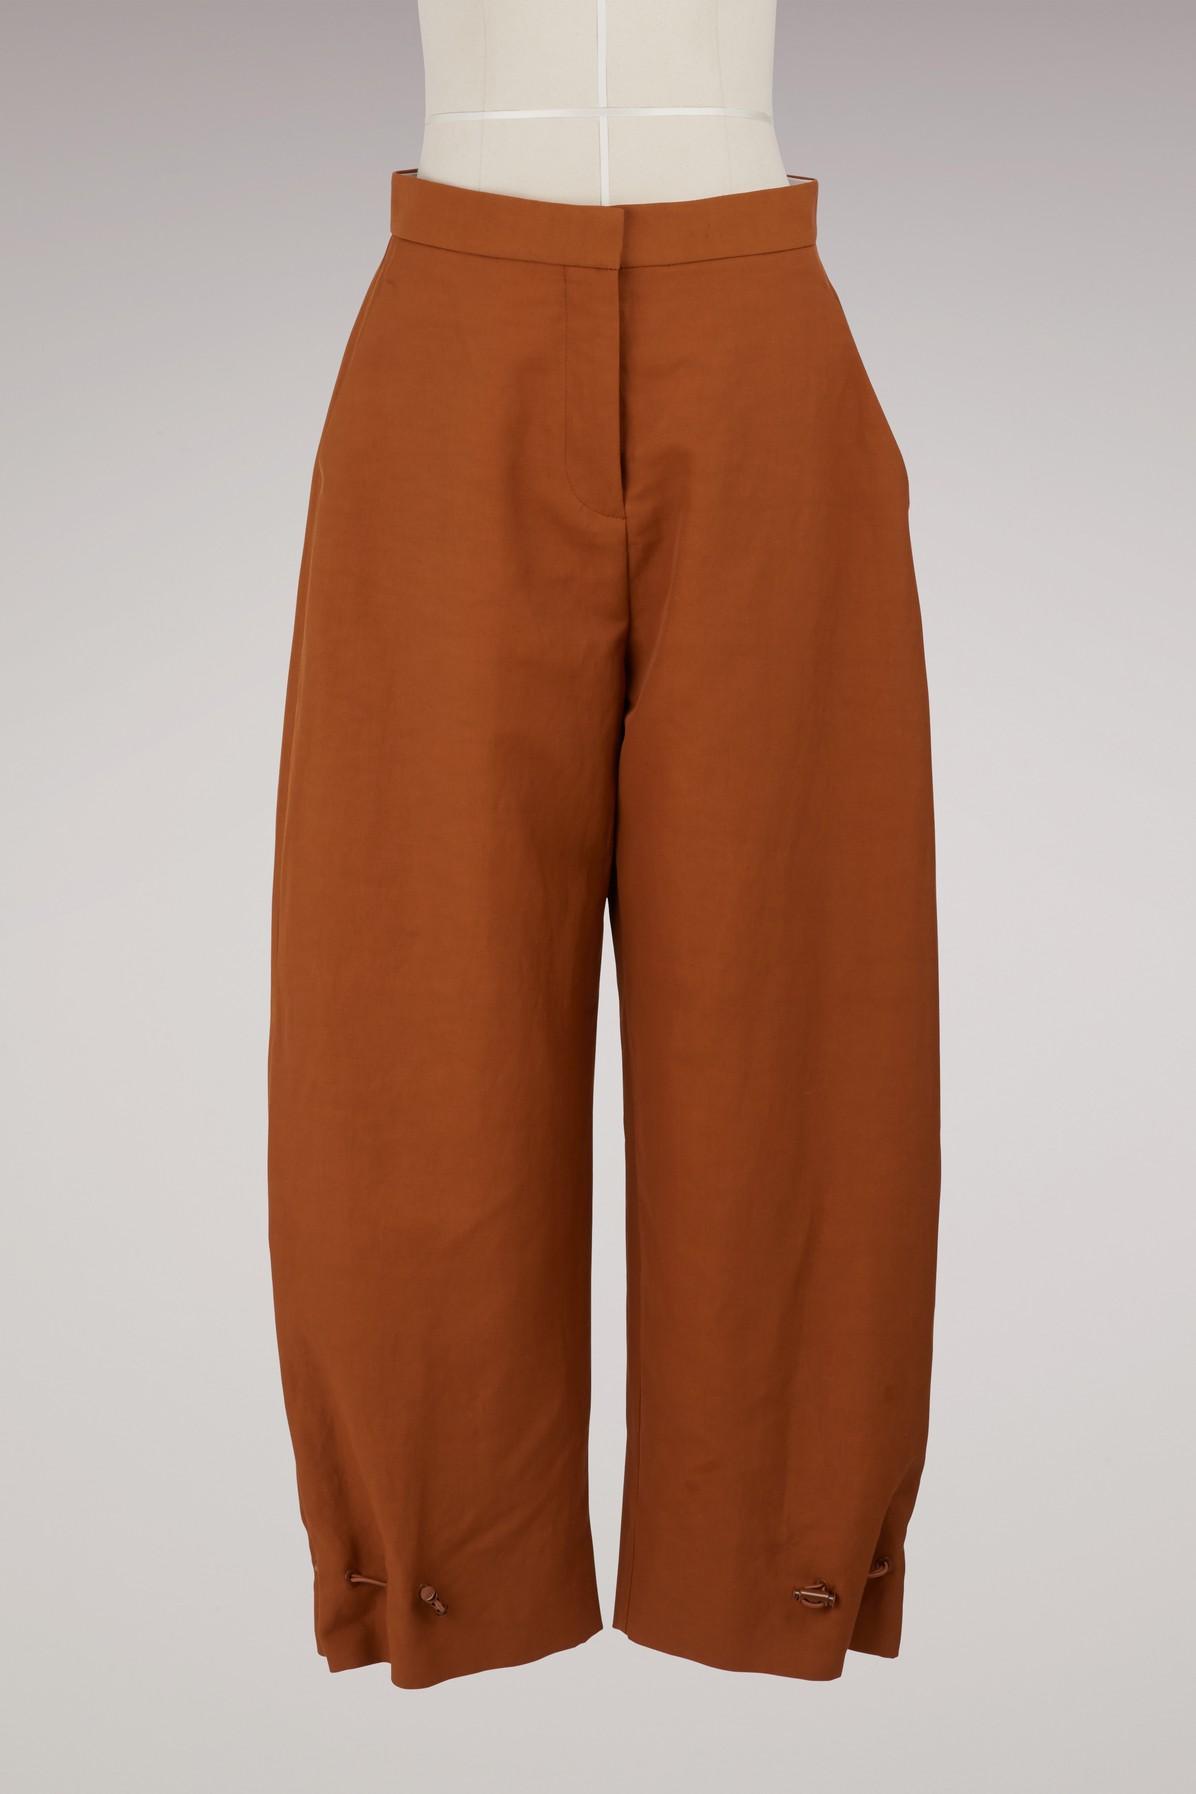 Stella Mccartney Linen Pants In 2200-pecan